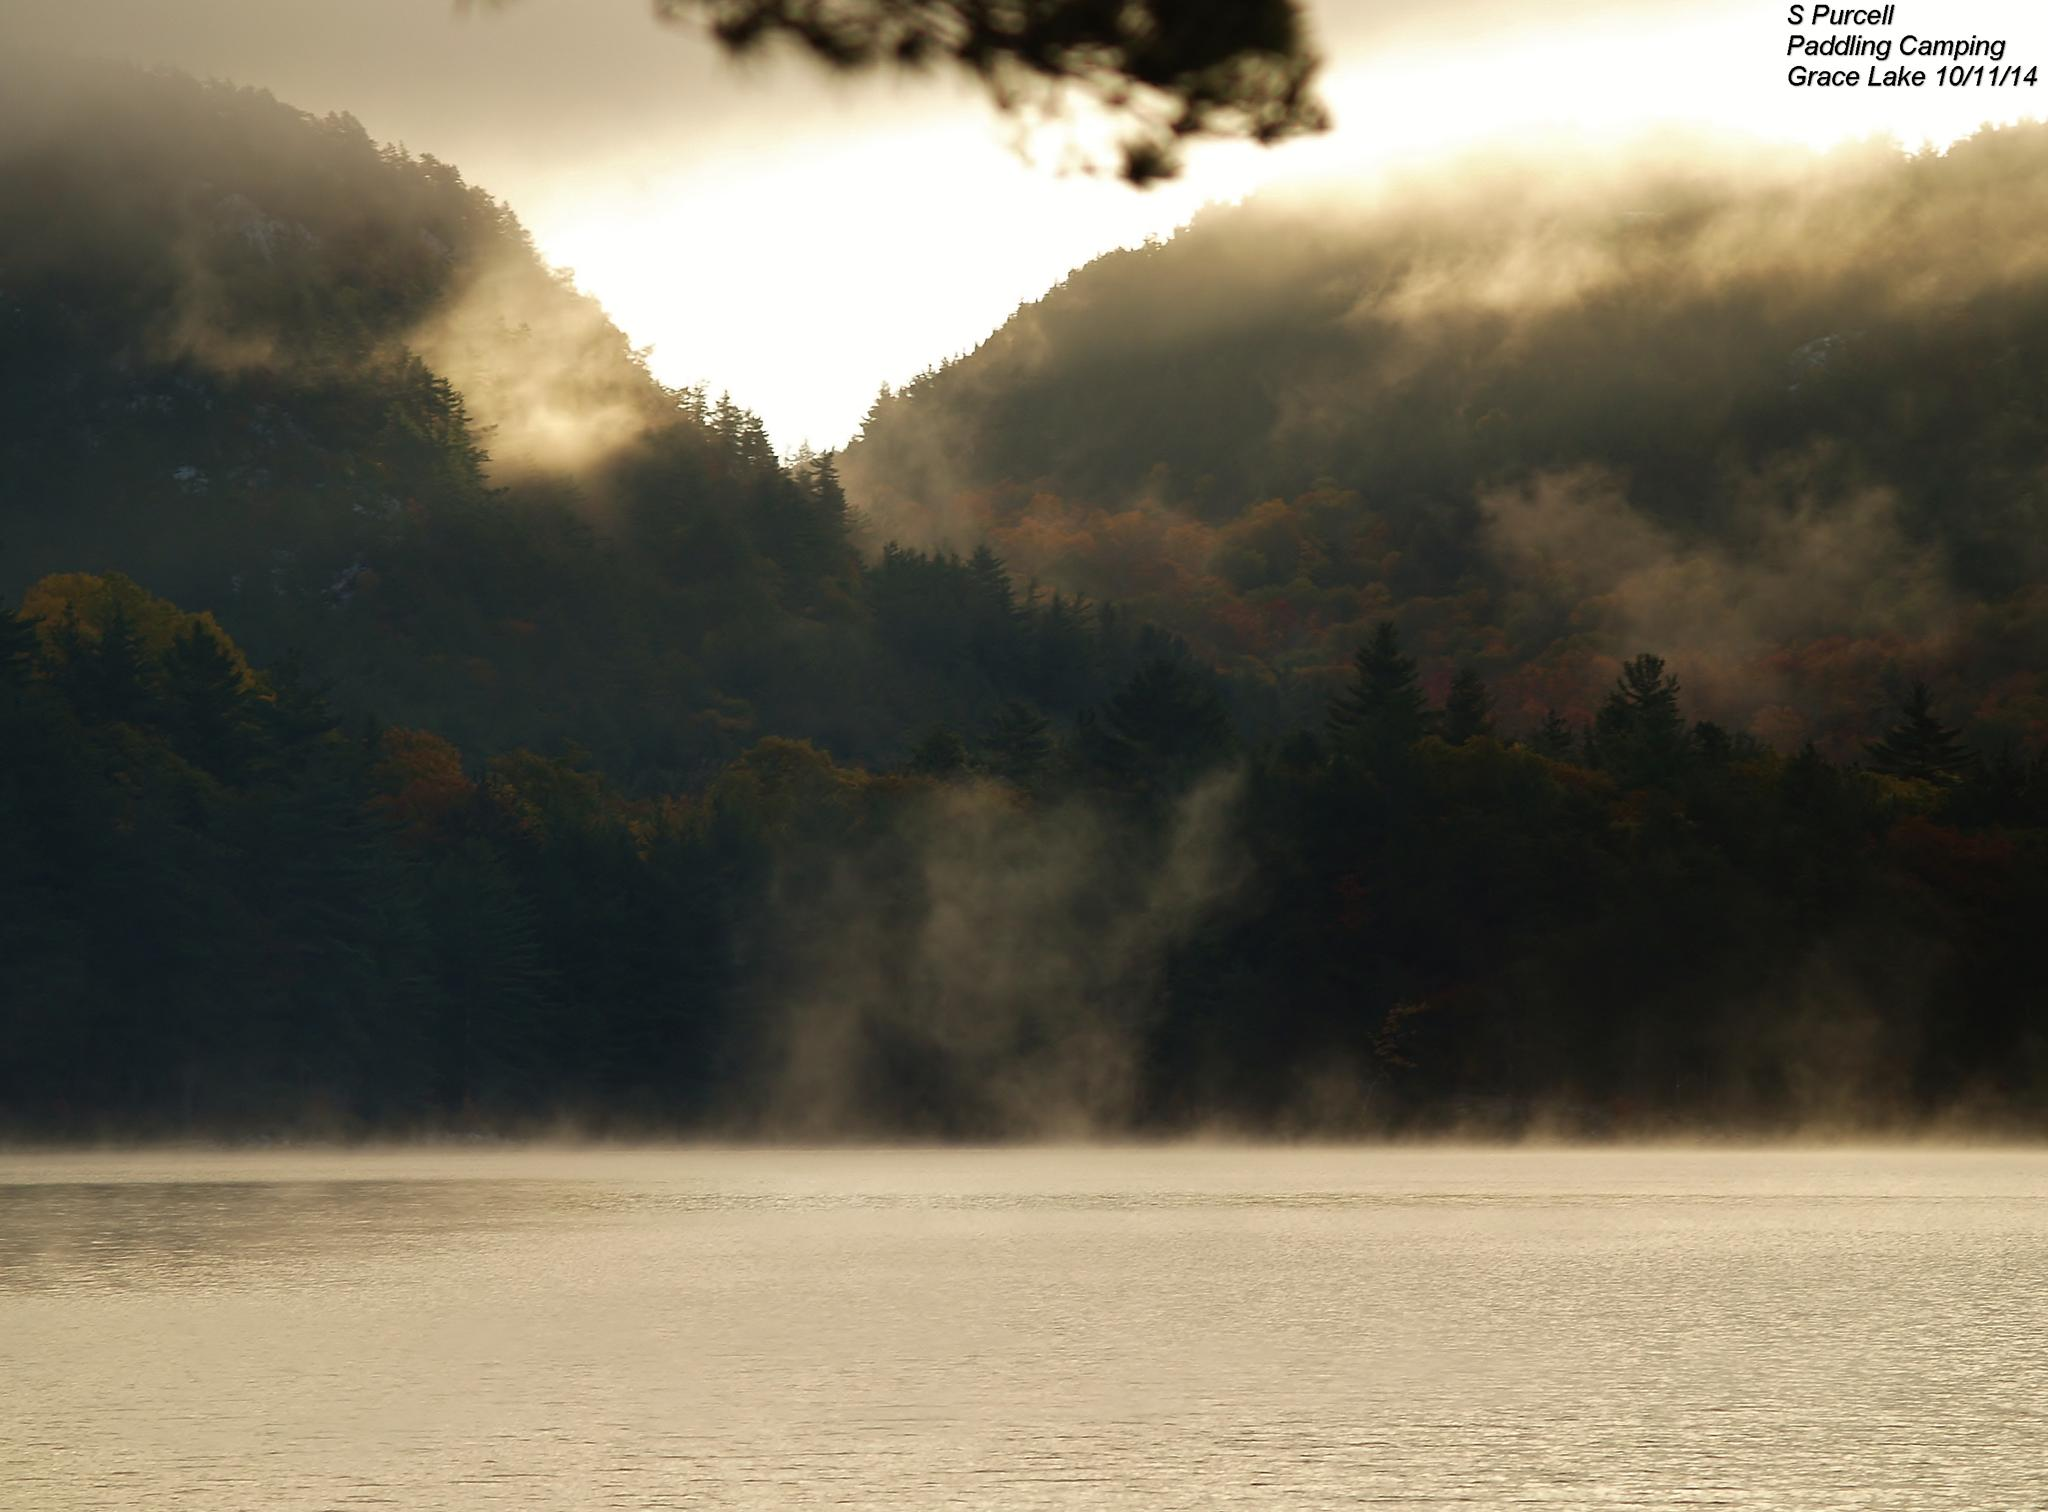 Wilderness awakening  by Sean Purcell